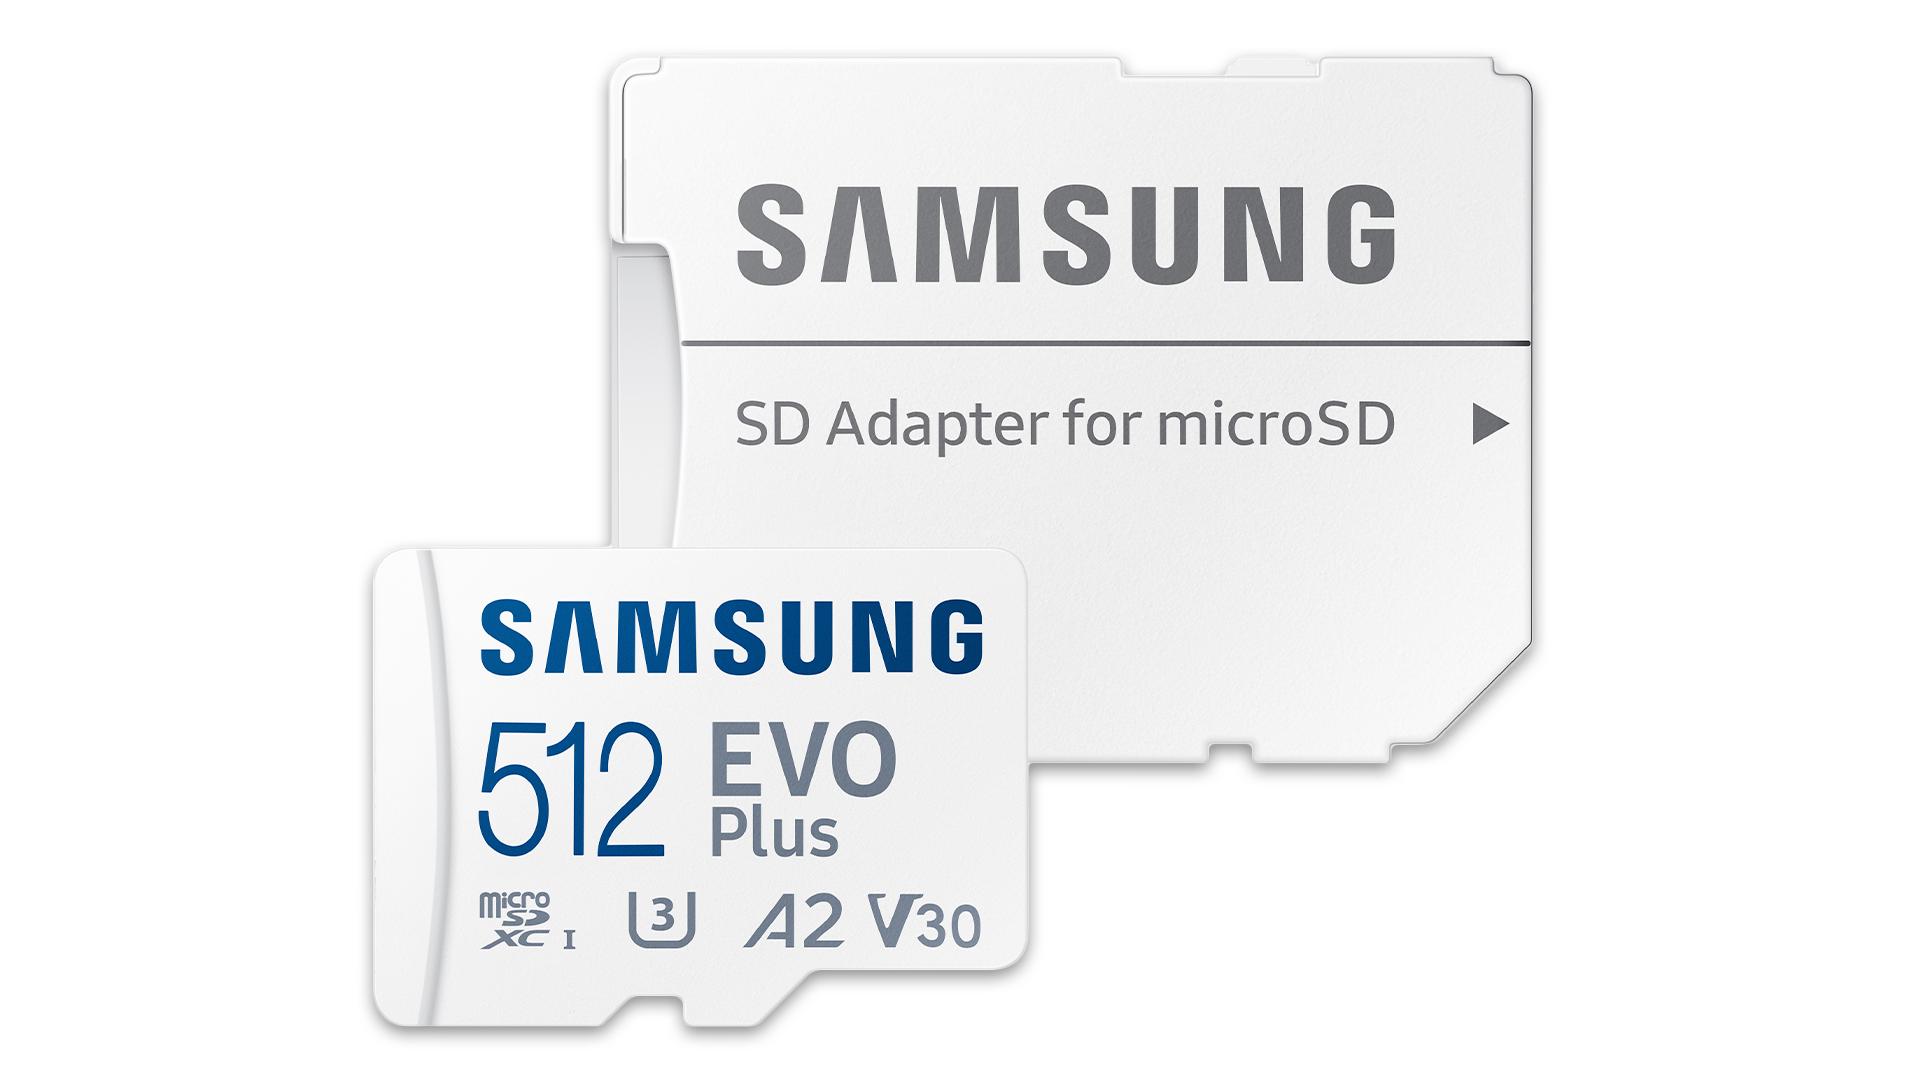 Samsung EVO Plus microSD card and adapter for regular SD card slot.